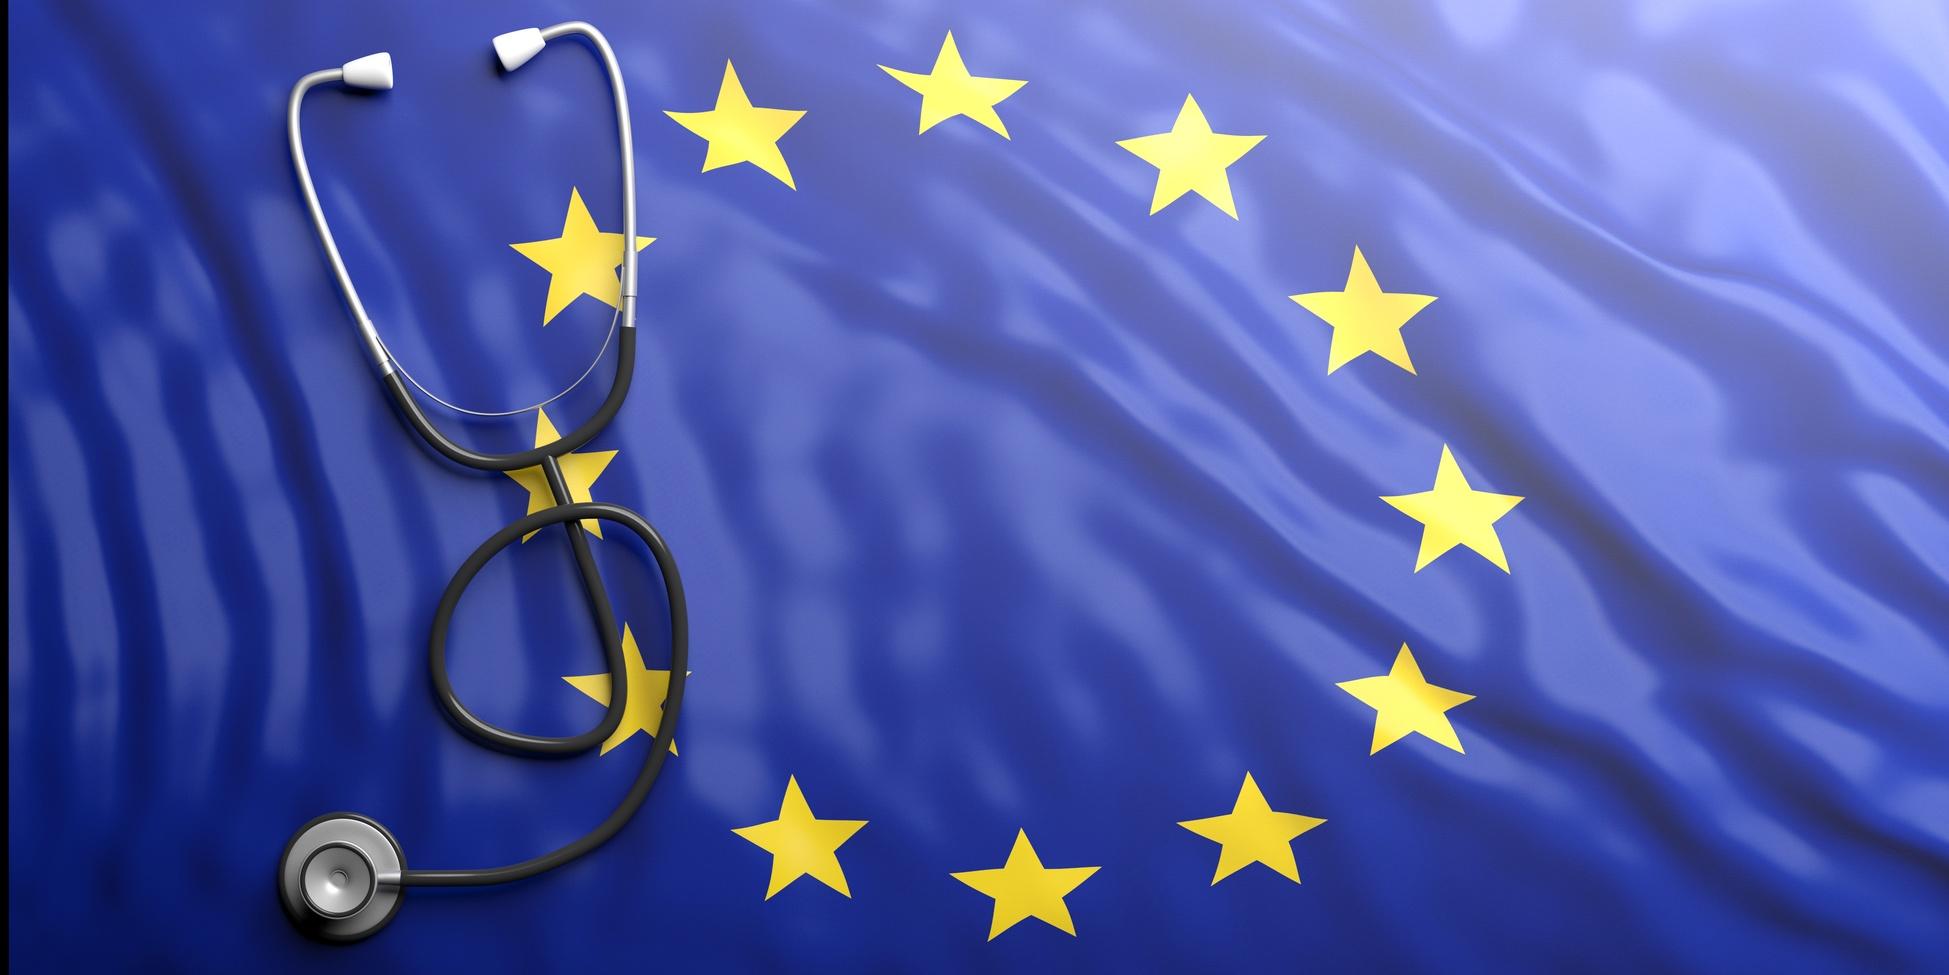 Carte Europeenne Dassurance Maladie Utilite.Je Suis Europeen Sans Carte Europeenne D Assurance Maladie